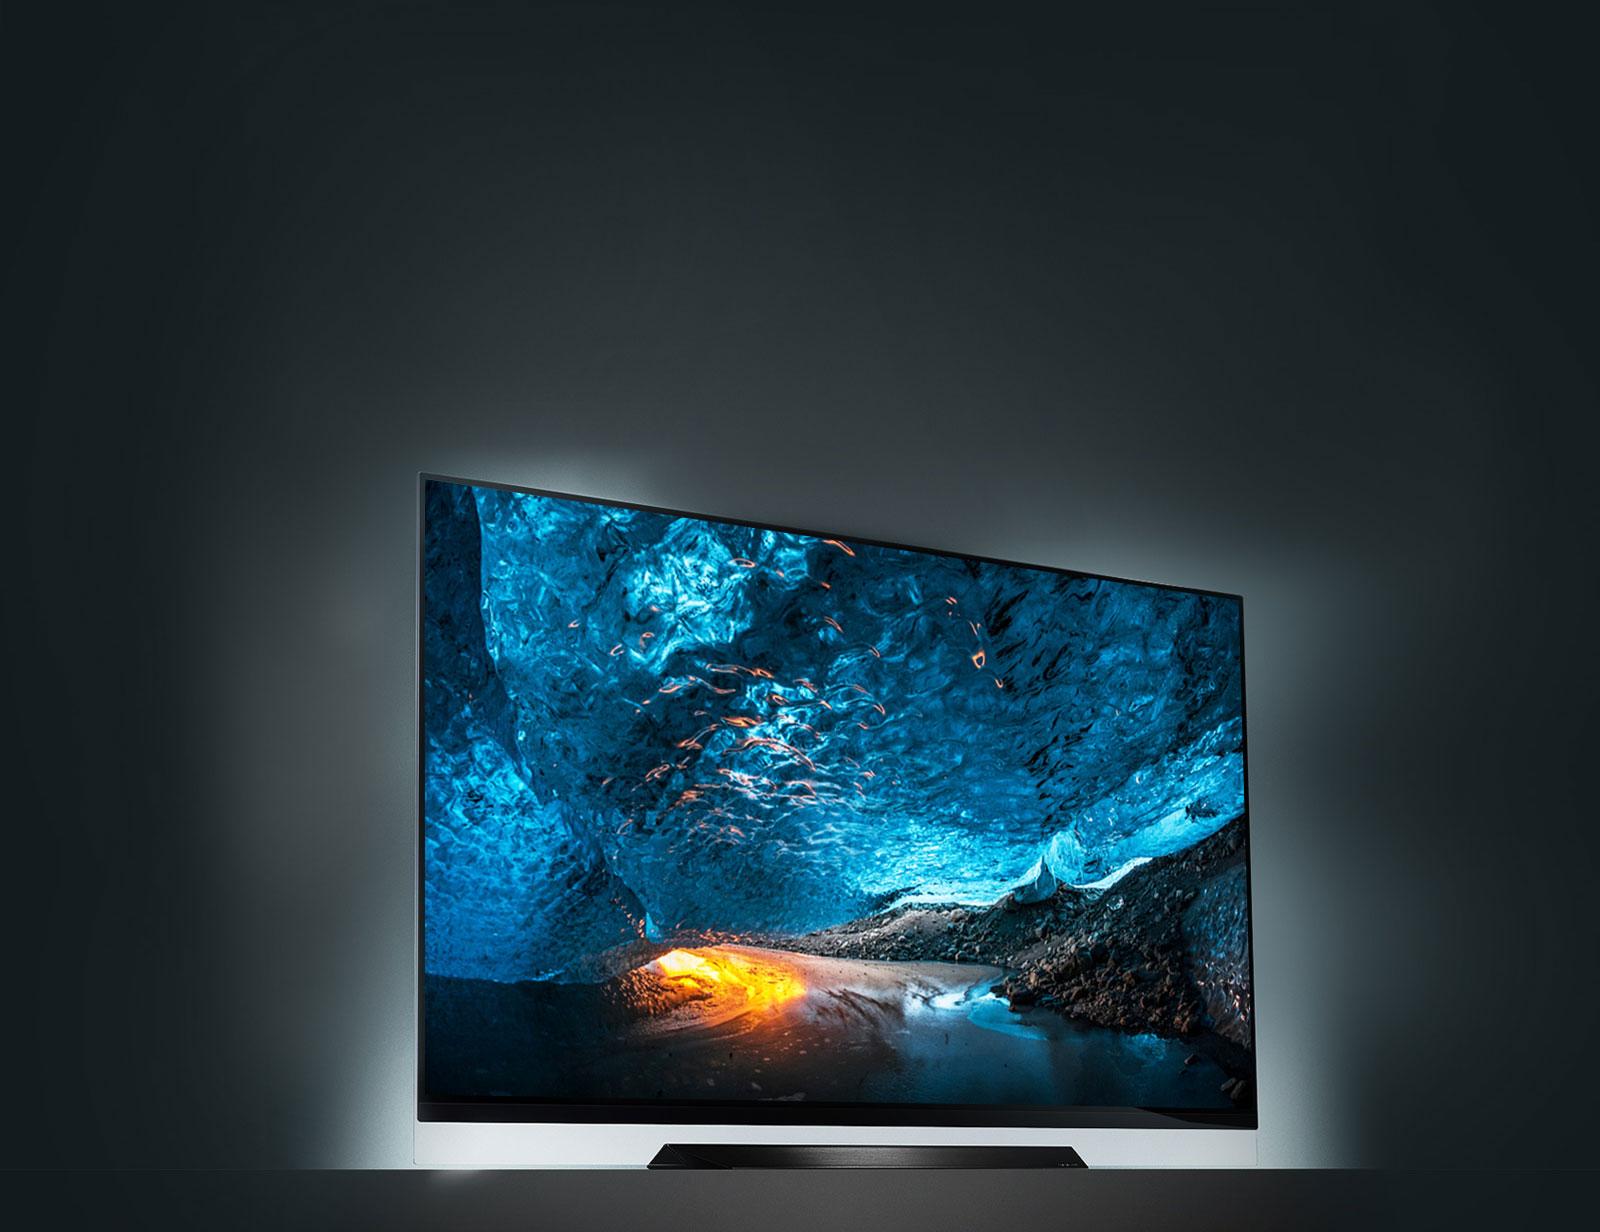 LG 4K OLED TV E8_2 (2)